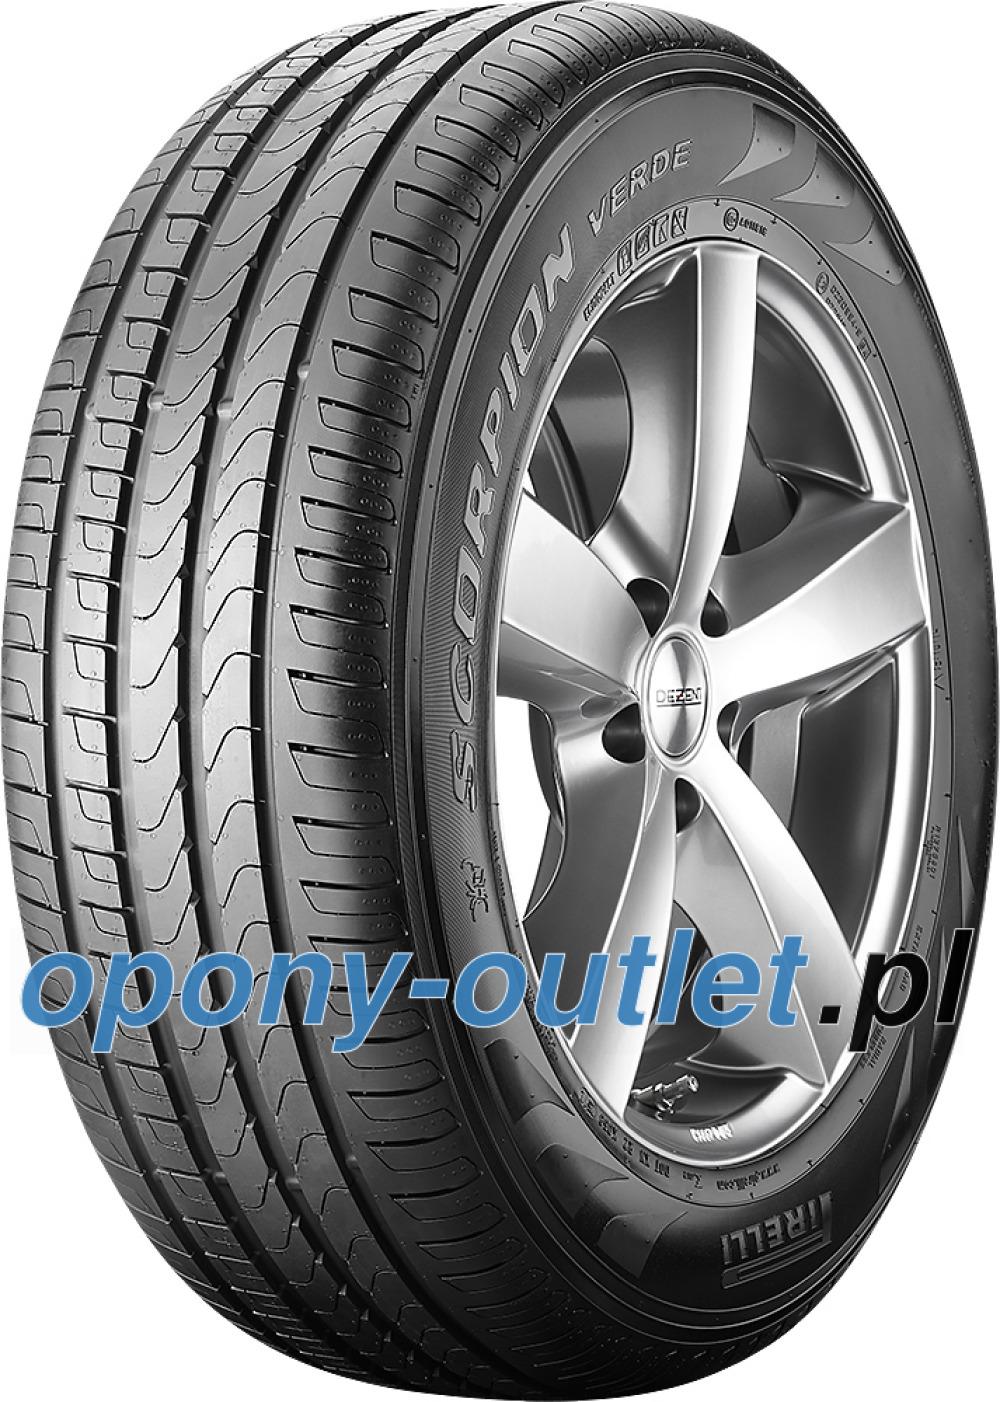 Pirelli Scorpion Verde ( 285/45 R20 112Y XL AO, ECOIMPACT, osłona felgi (MFS) )